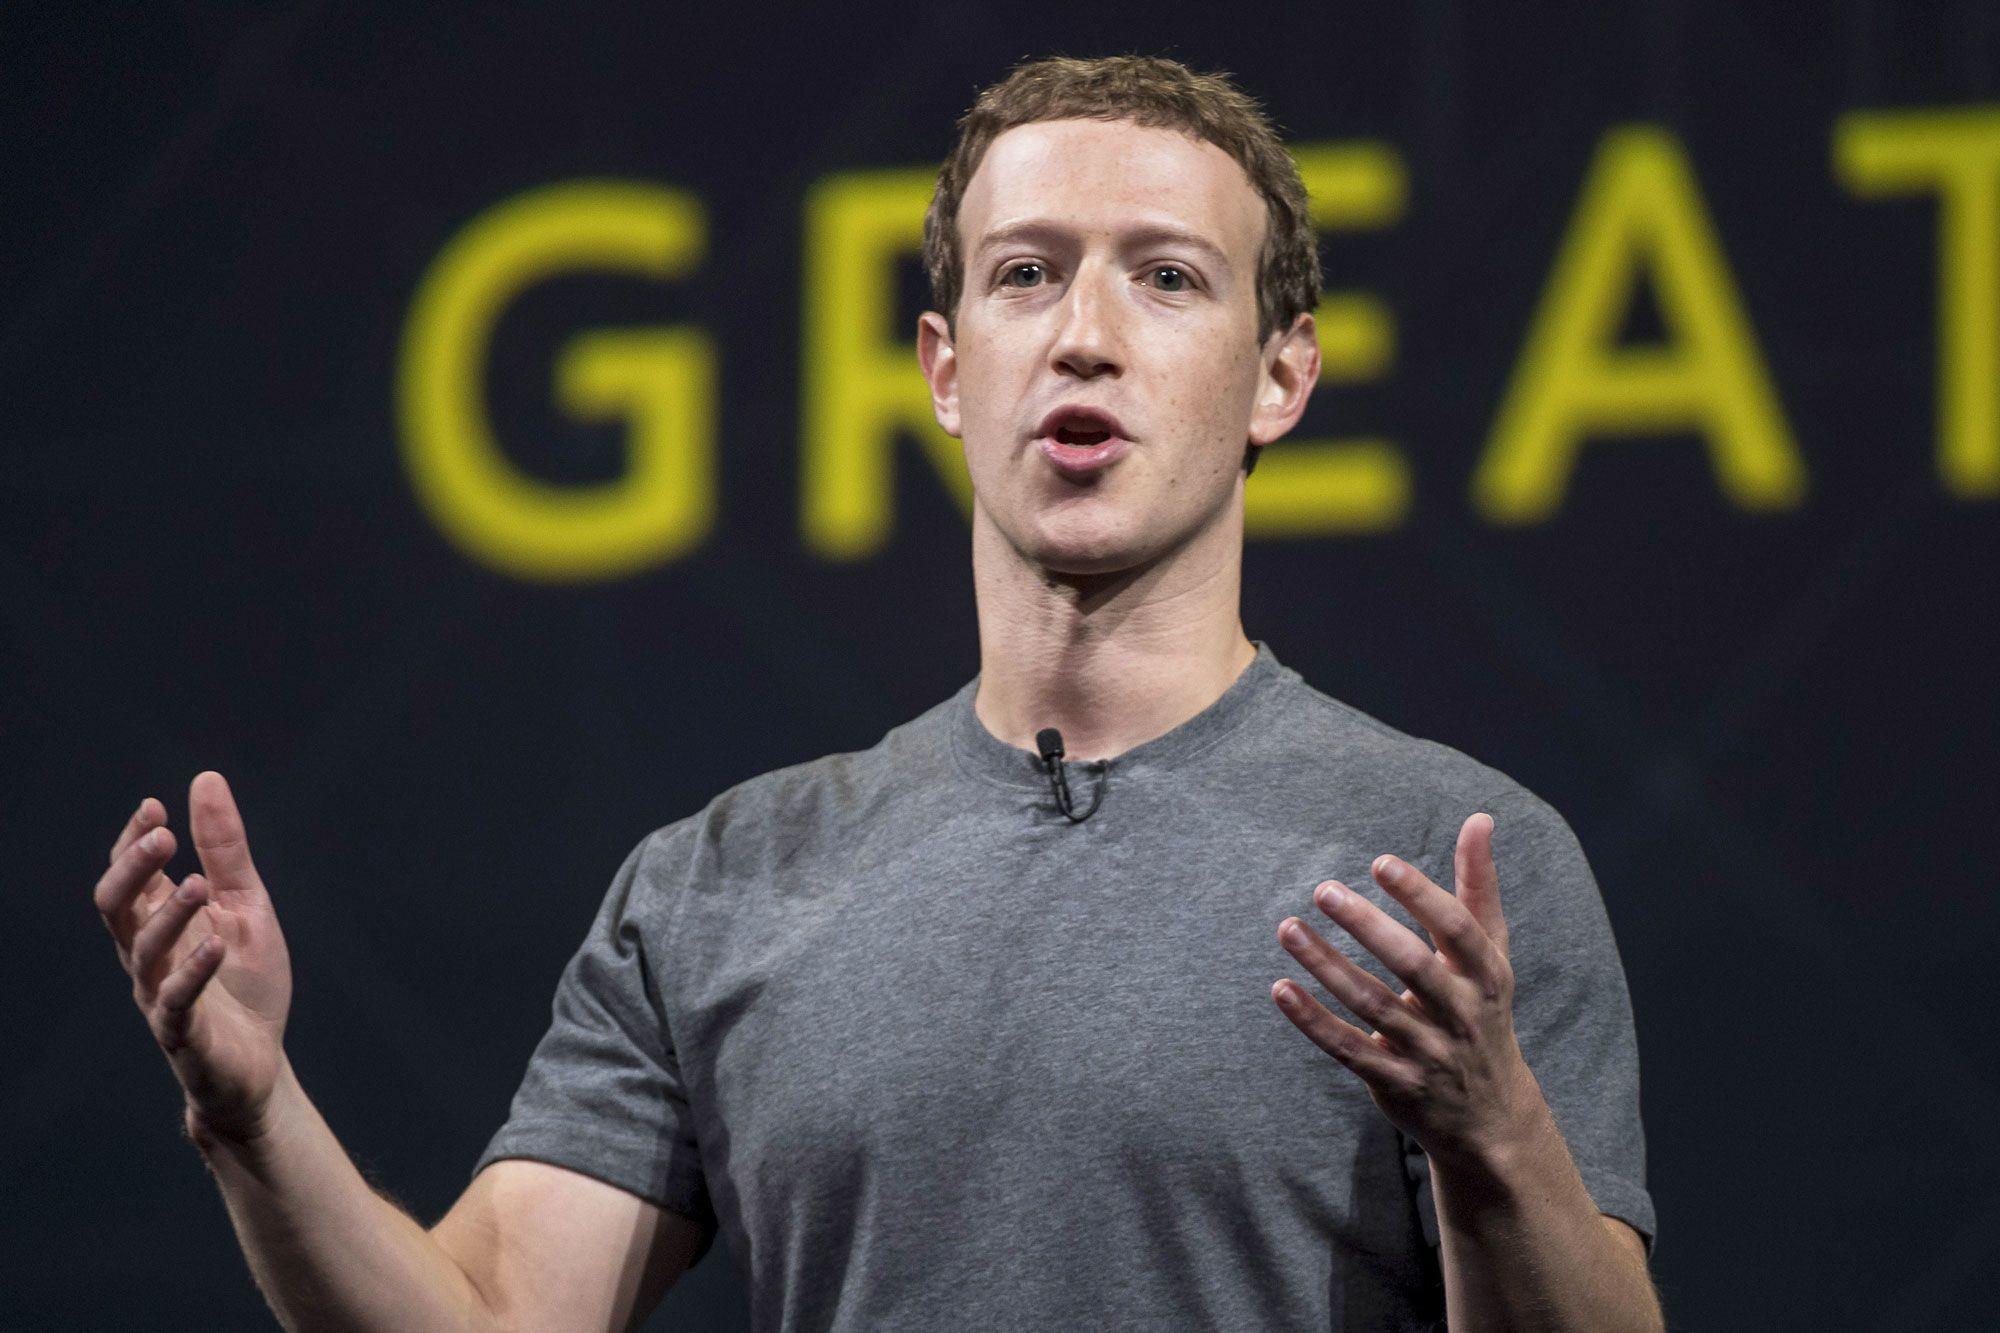 Политика Марка Цукерберга раскритикована ближайшими сторонниками